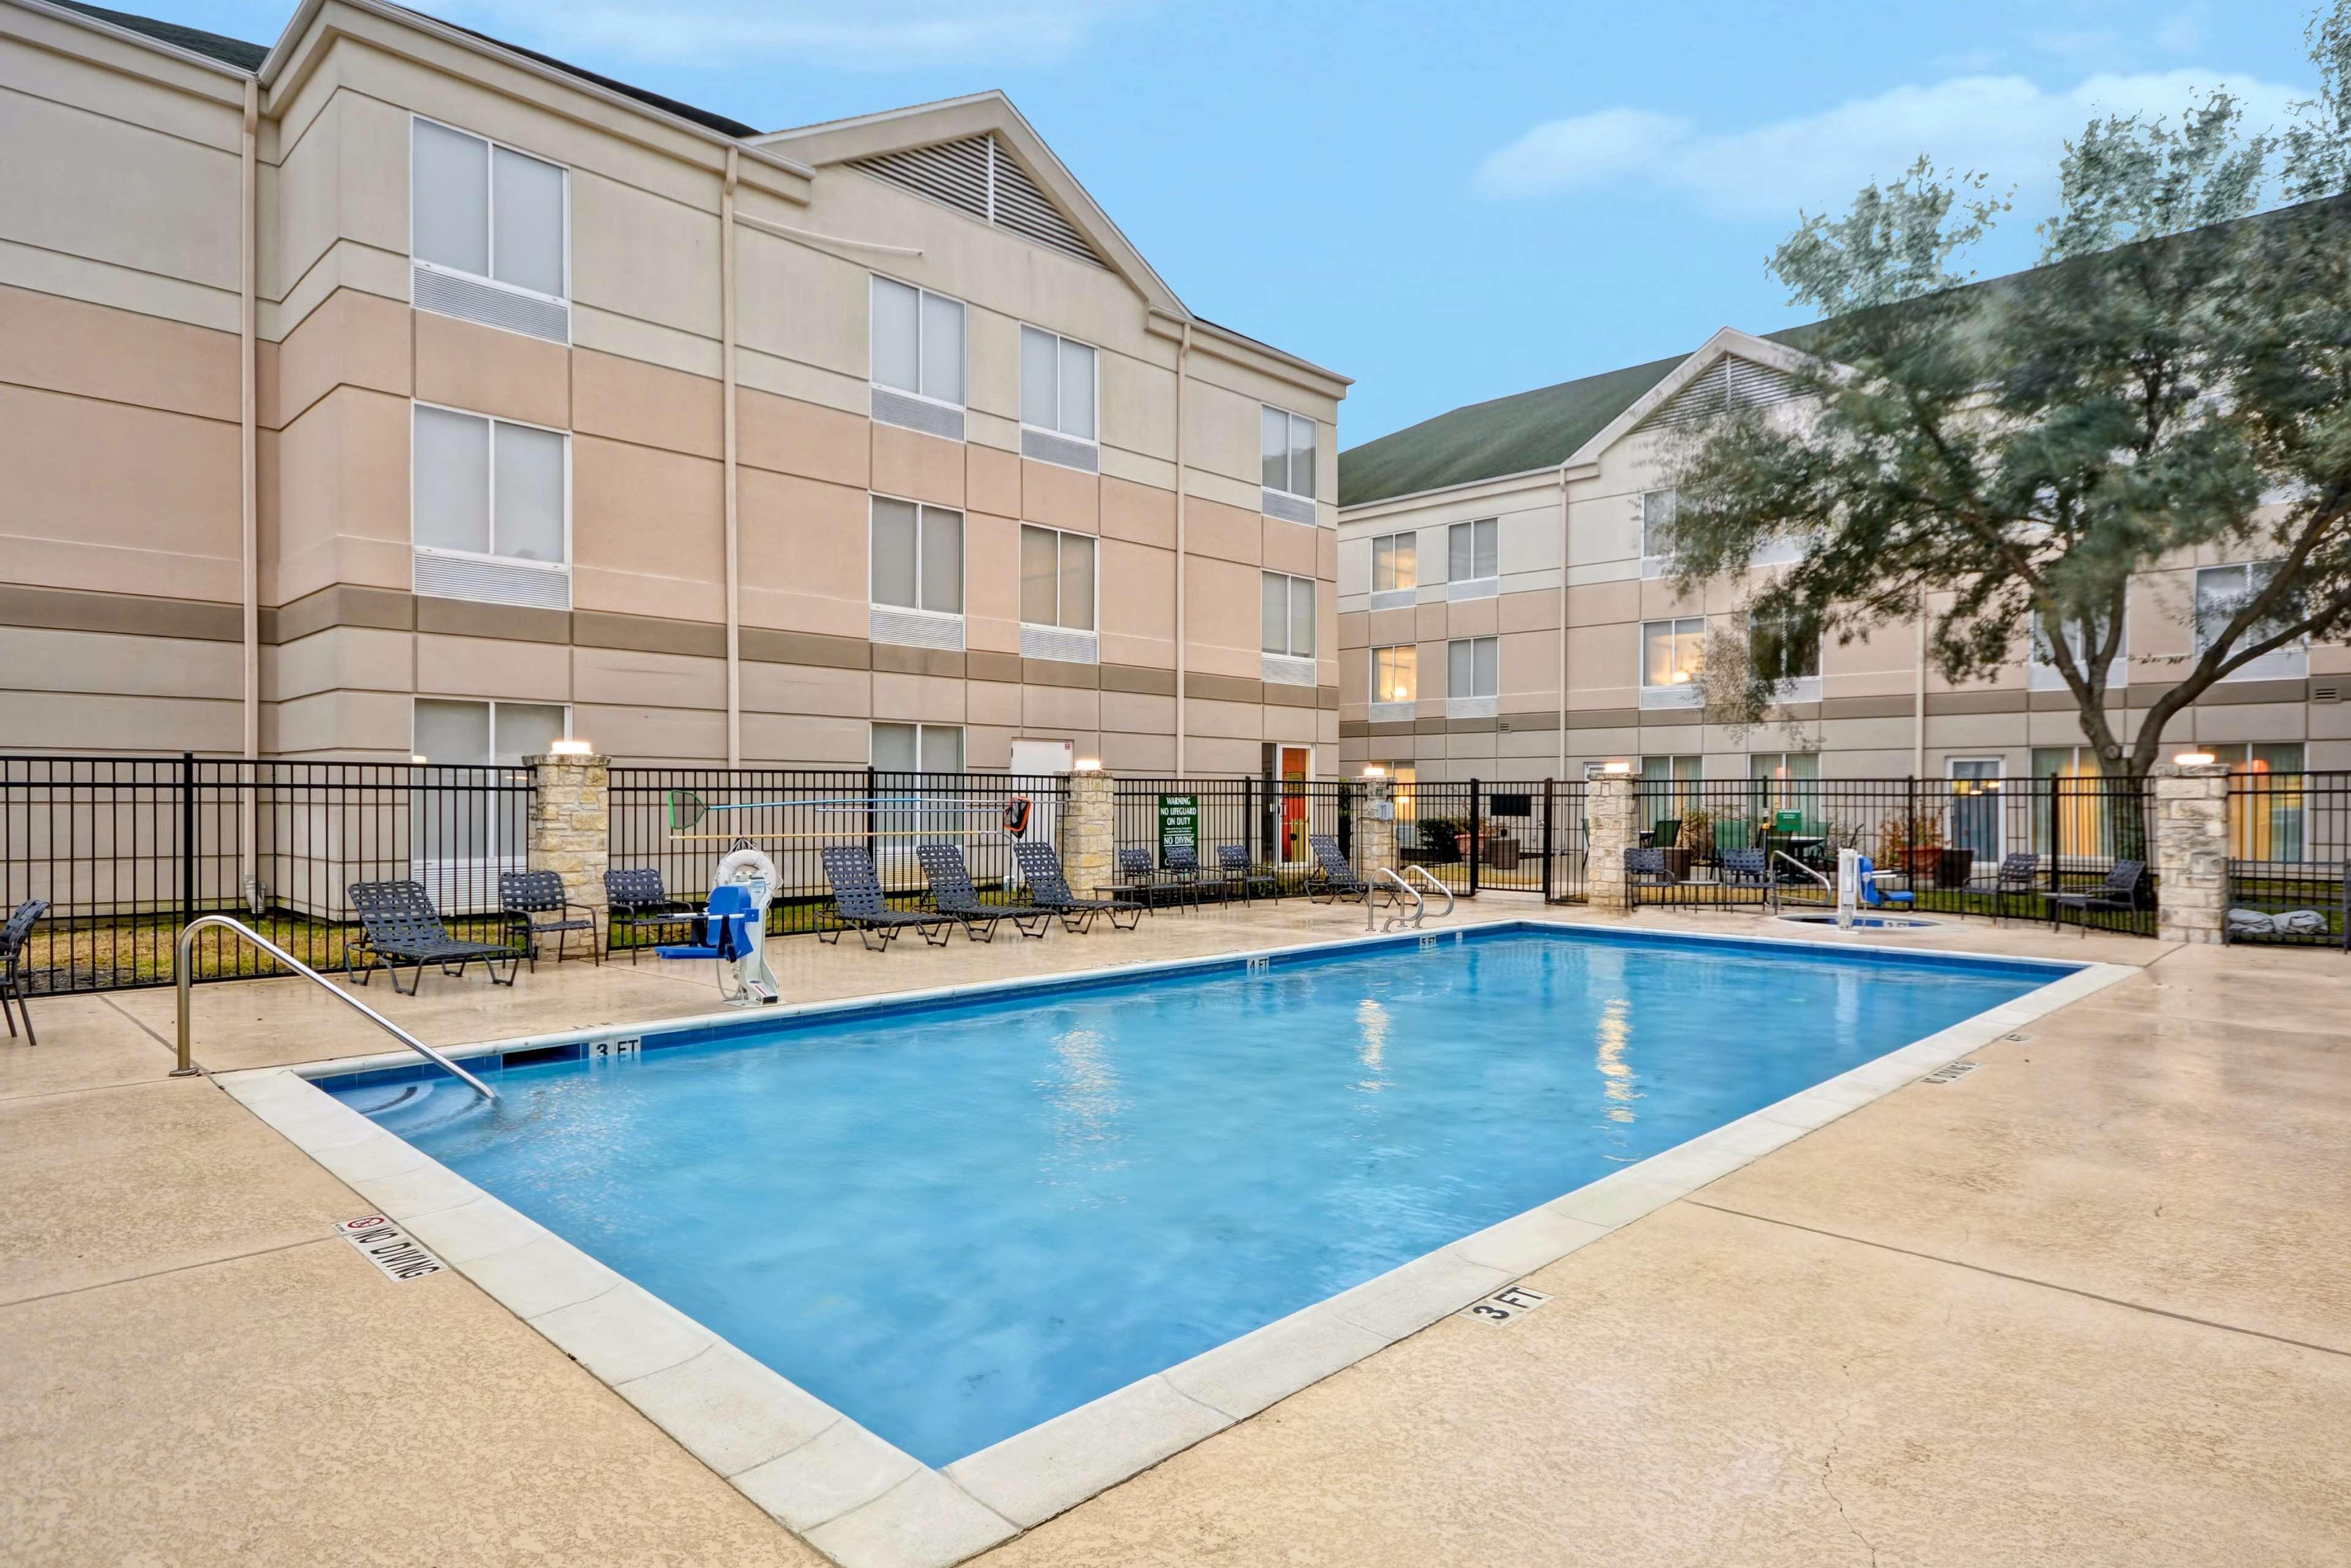 Hilton Garden Inn Austin/Round Rock image 7